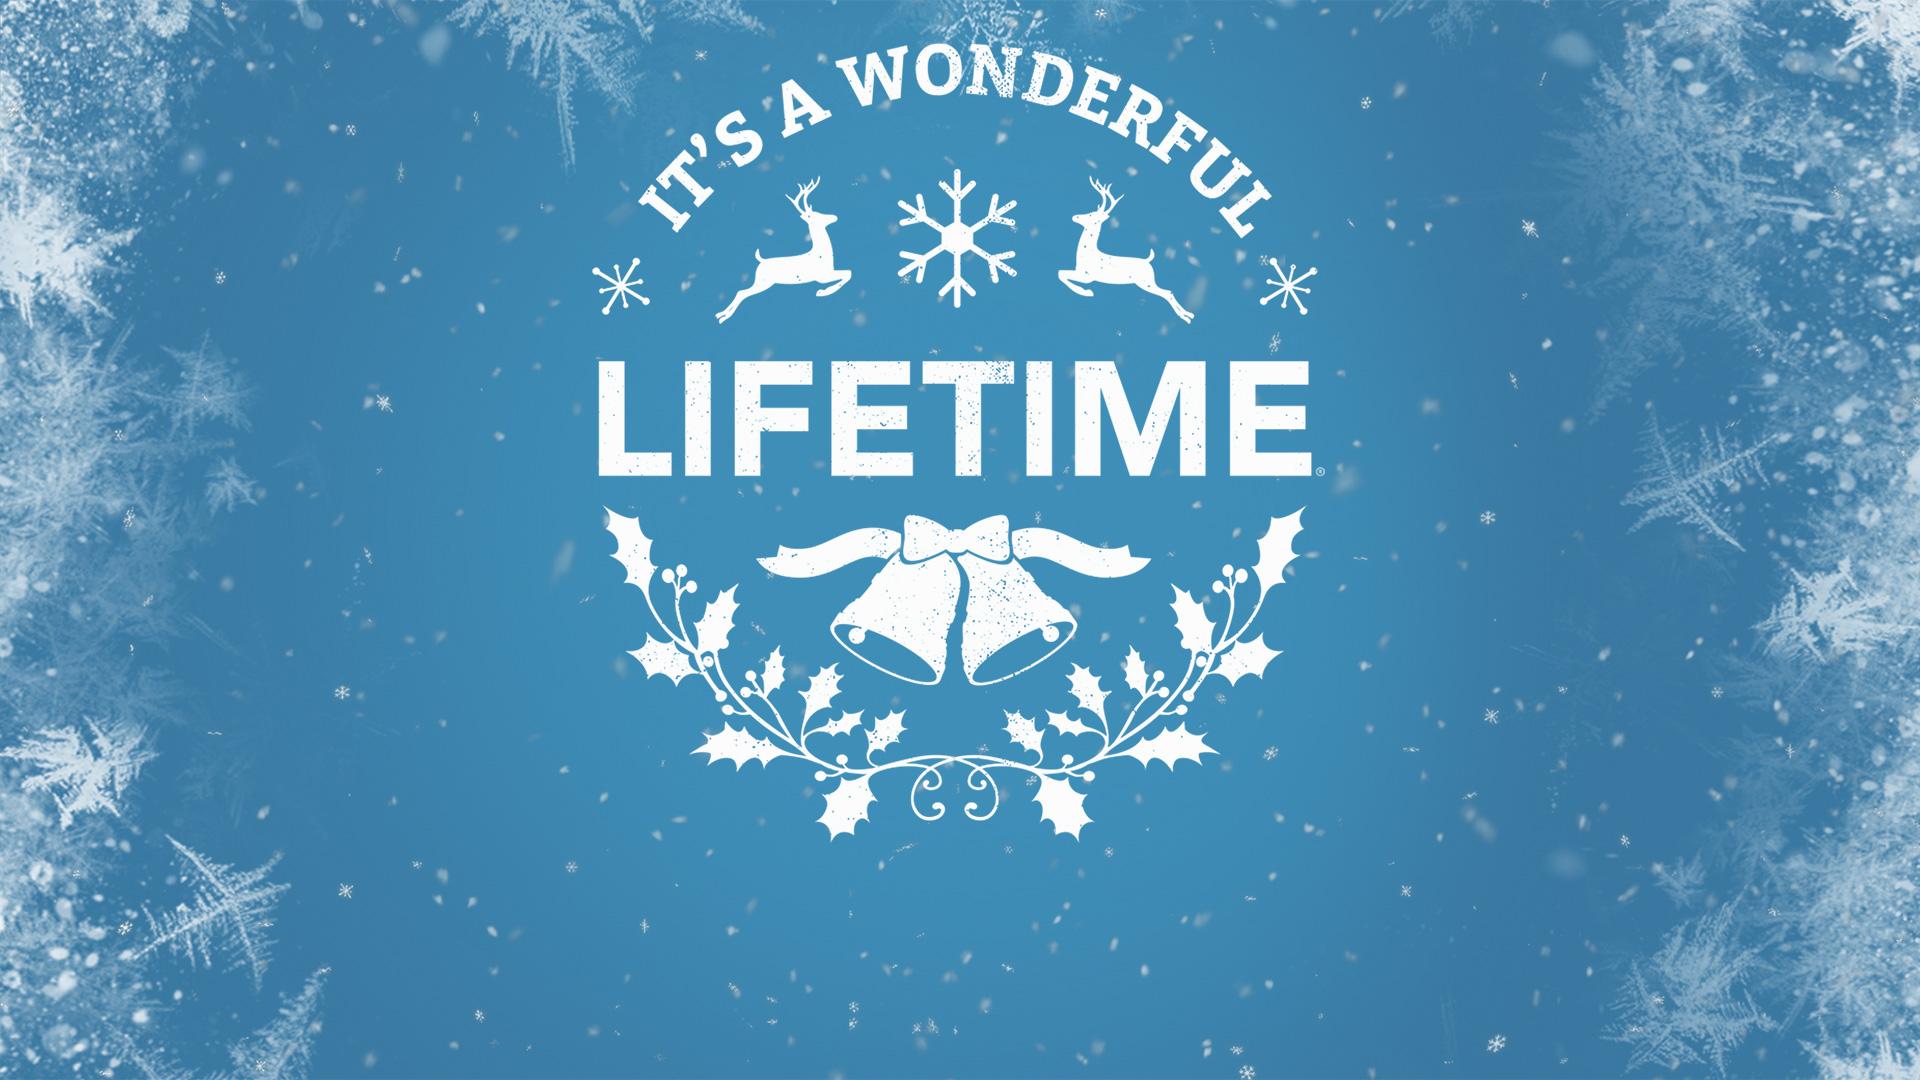 It's a Wonderful Lifetime